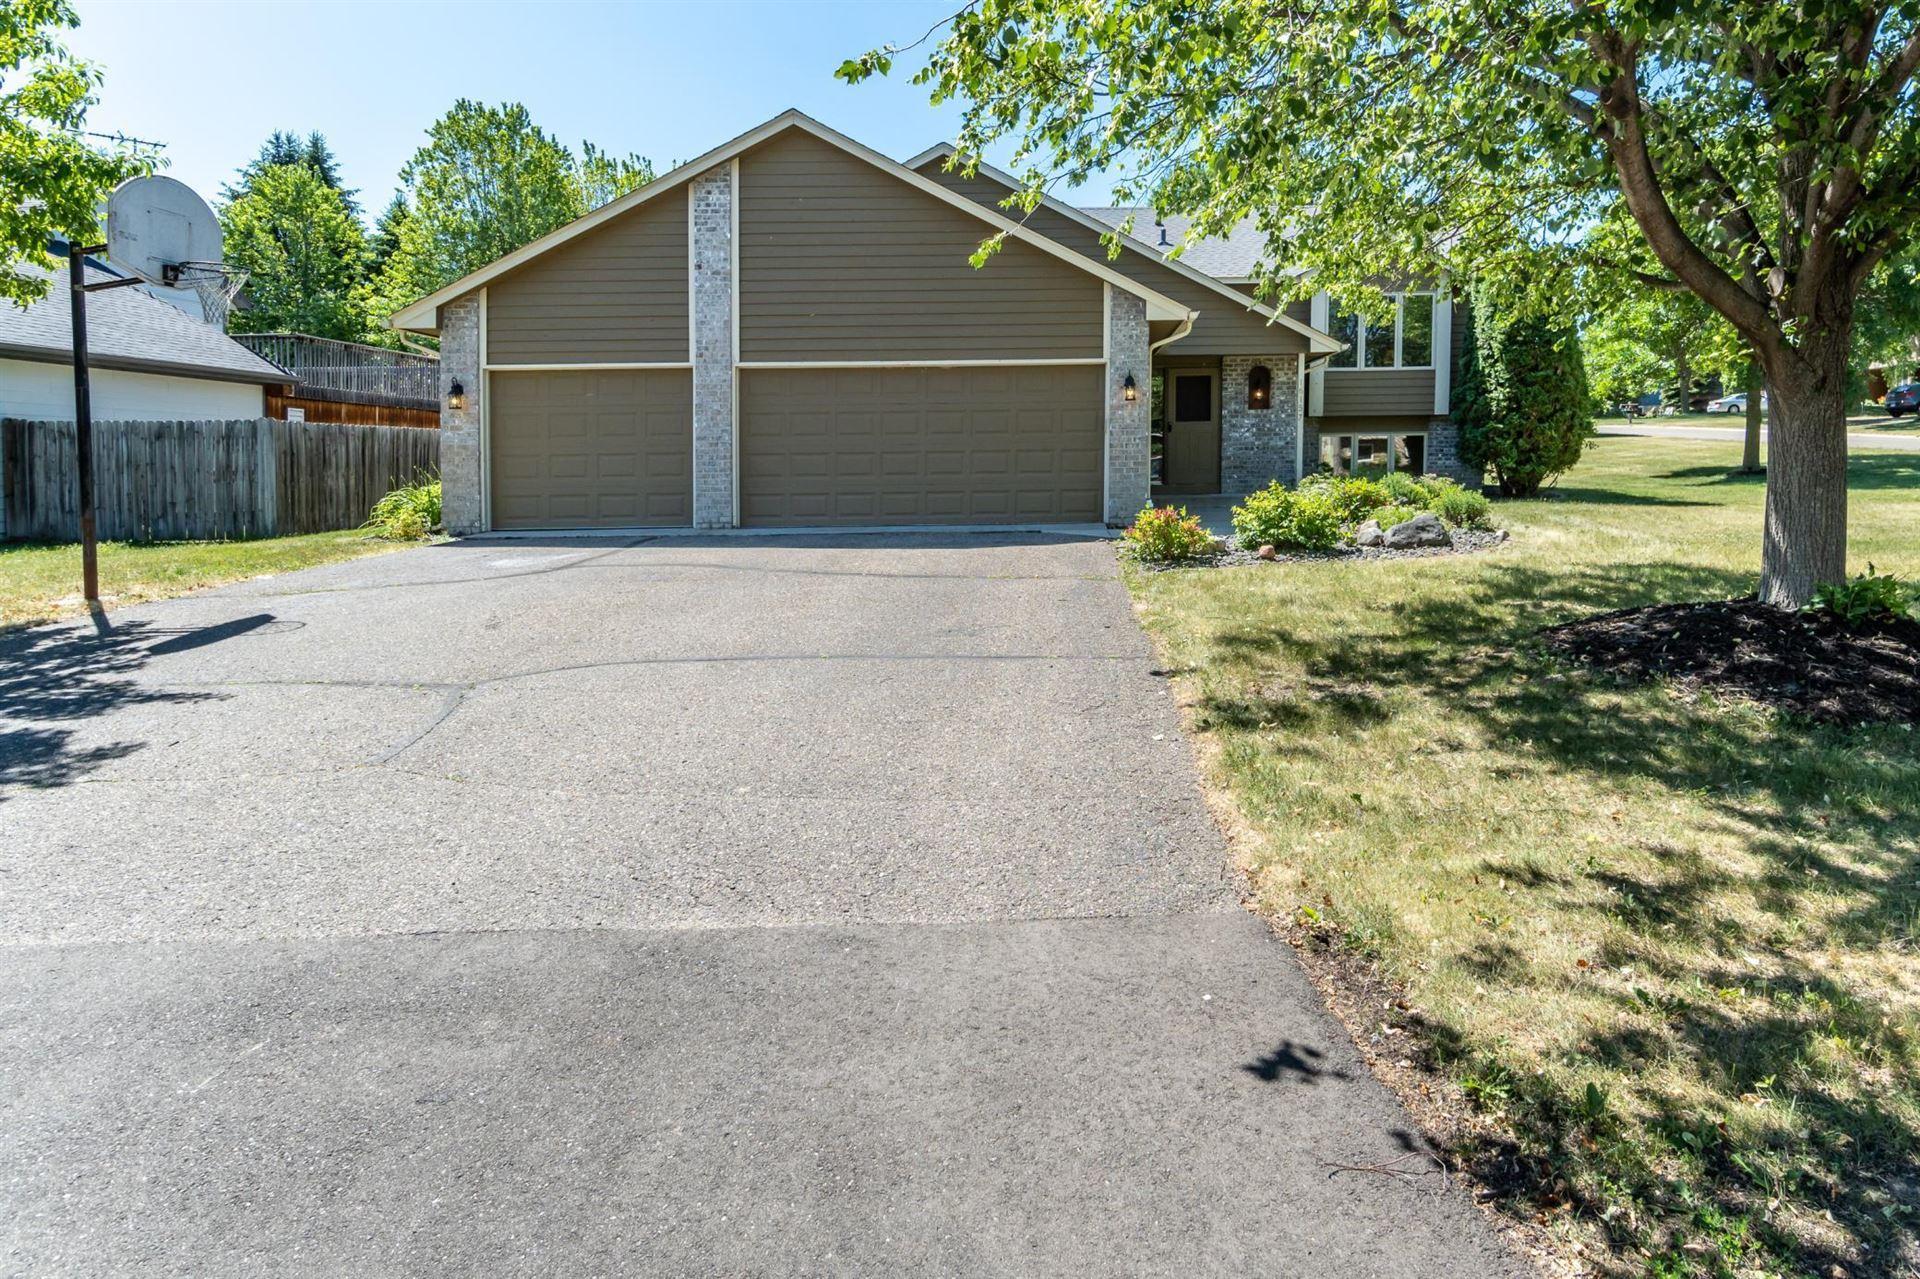 Photo of 16157 Logarto Lane, Lakeville, MN 55044 (MLS # 6070943)